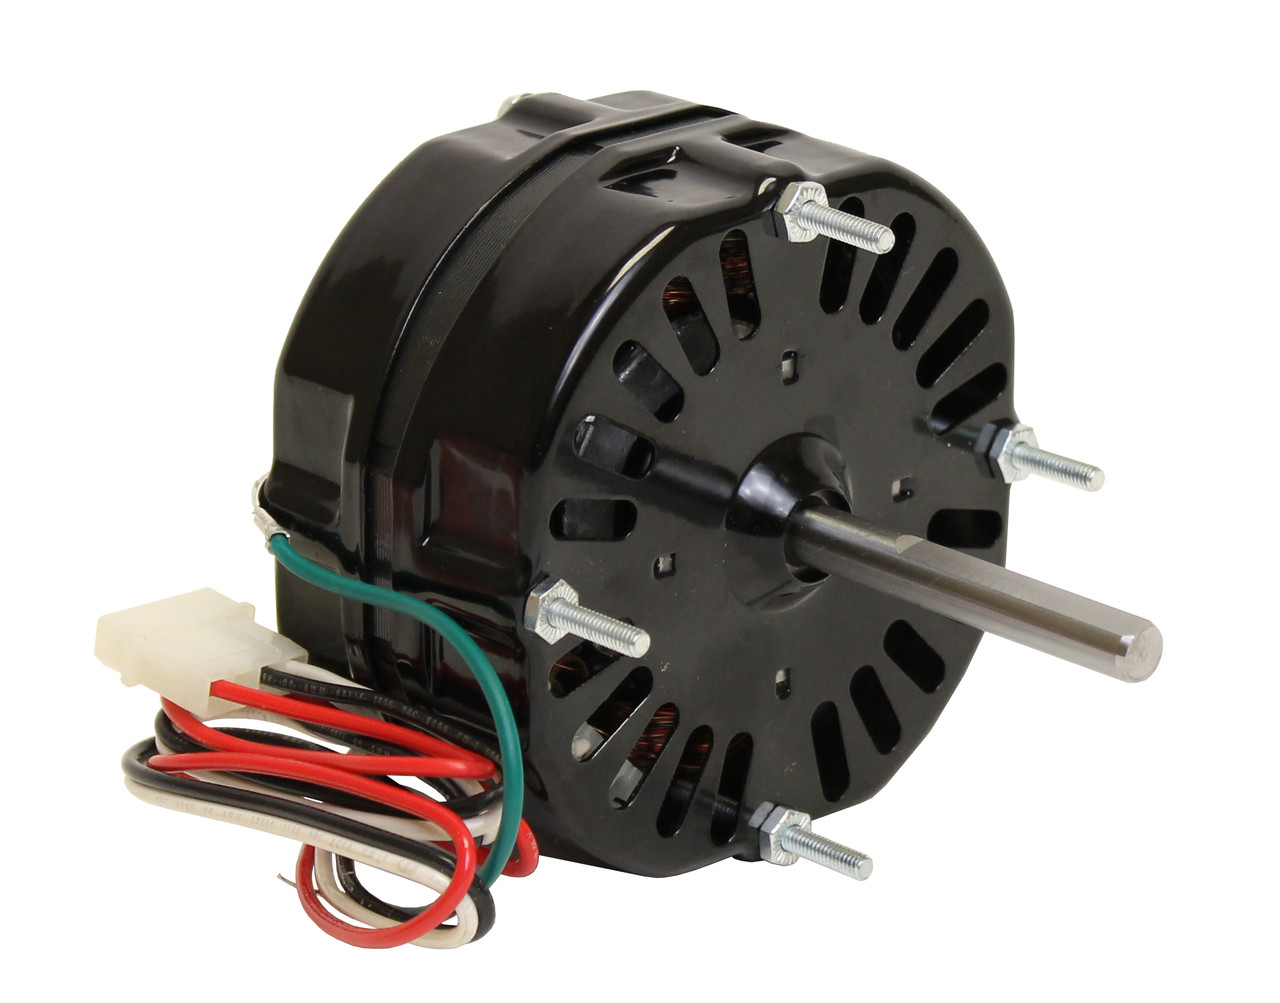 615053A__31268.1504204697.1280.1280?c=2 dayton, broan and lomanco attic fan motors electric motor warehouse  at gsmportal.co